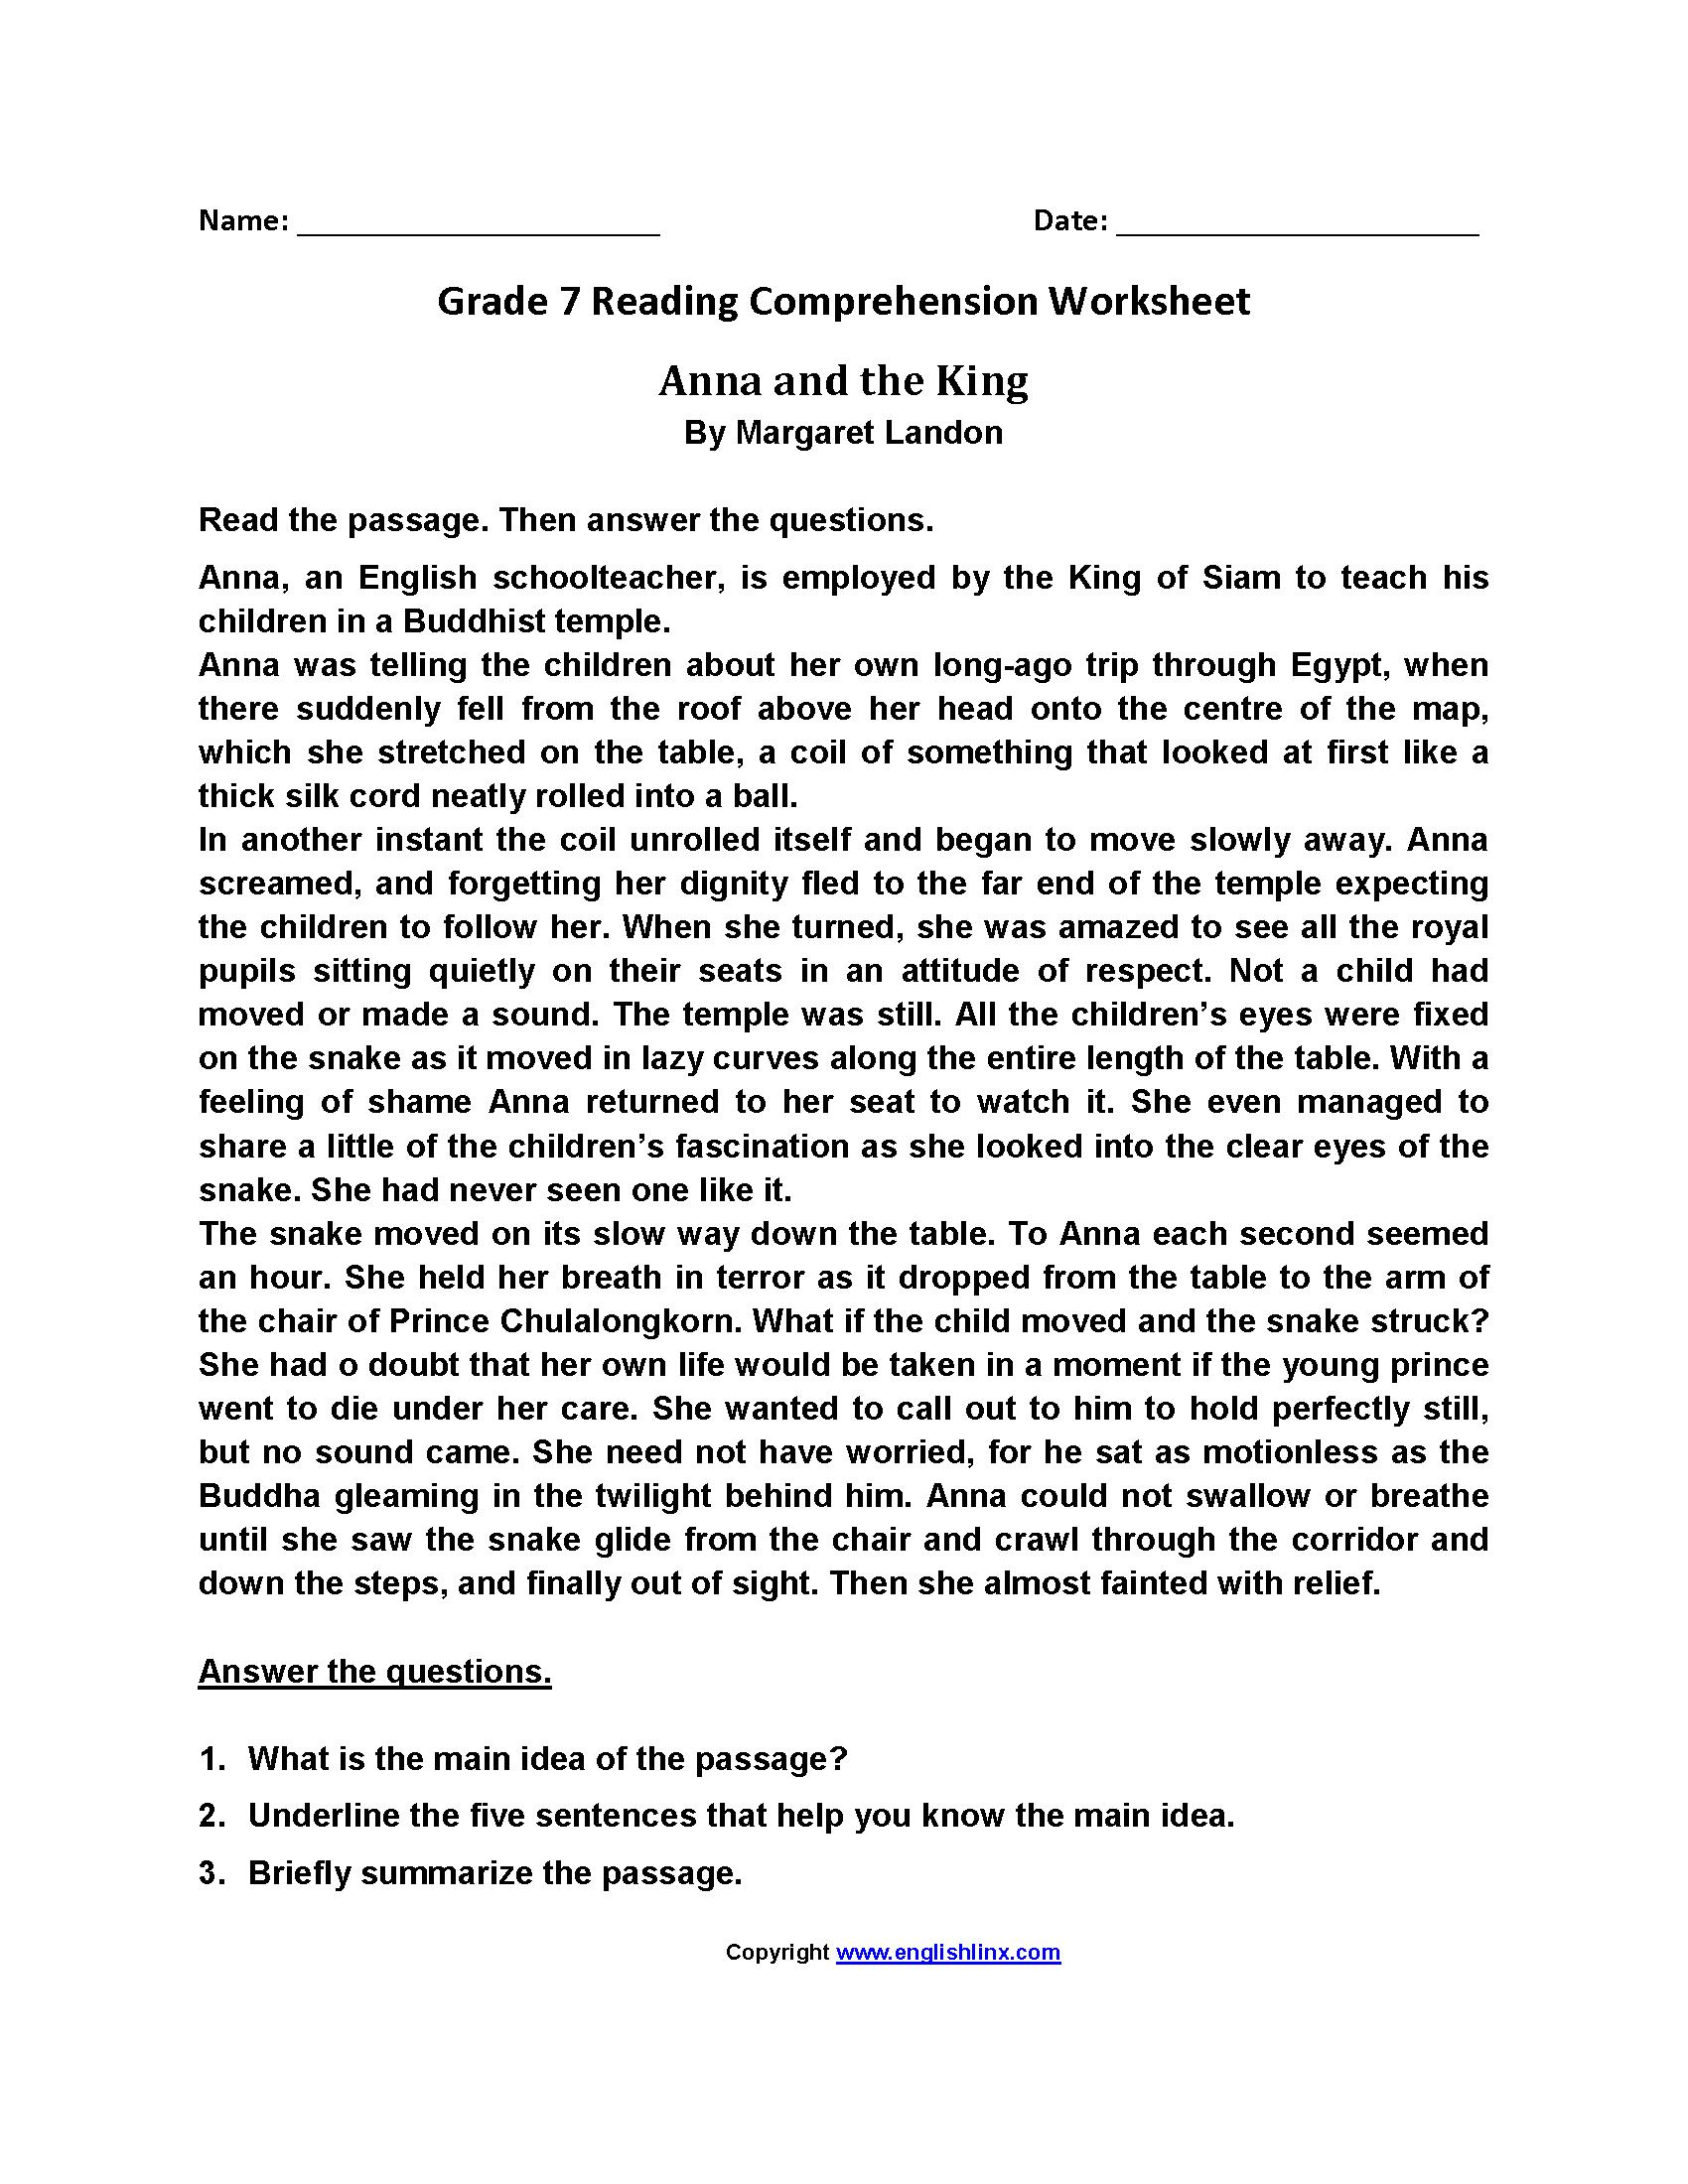 Free Reading Comprehension Worksheets 7th Grade and Reading Worksheets Seventh Grade Reading Worksheets